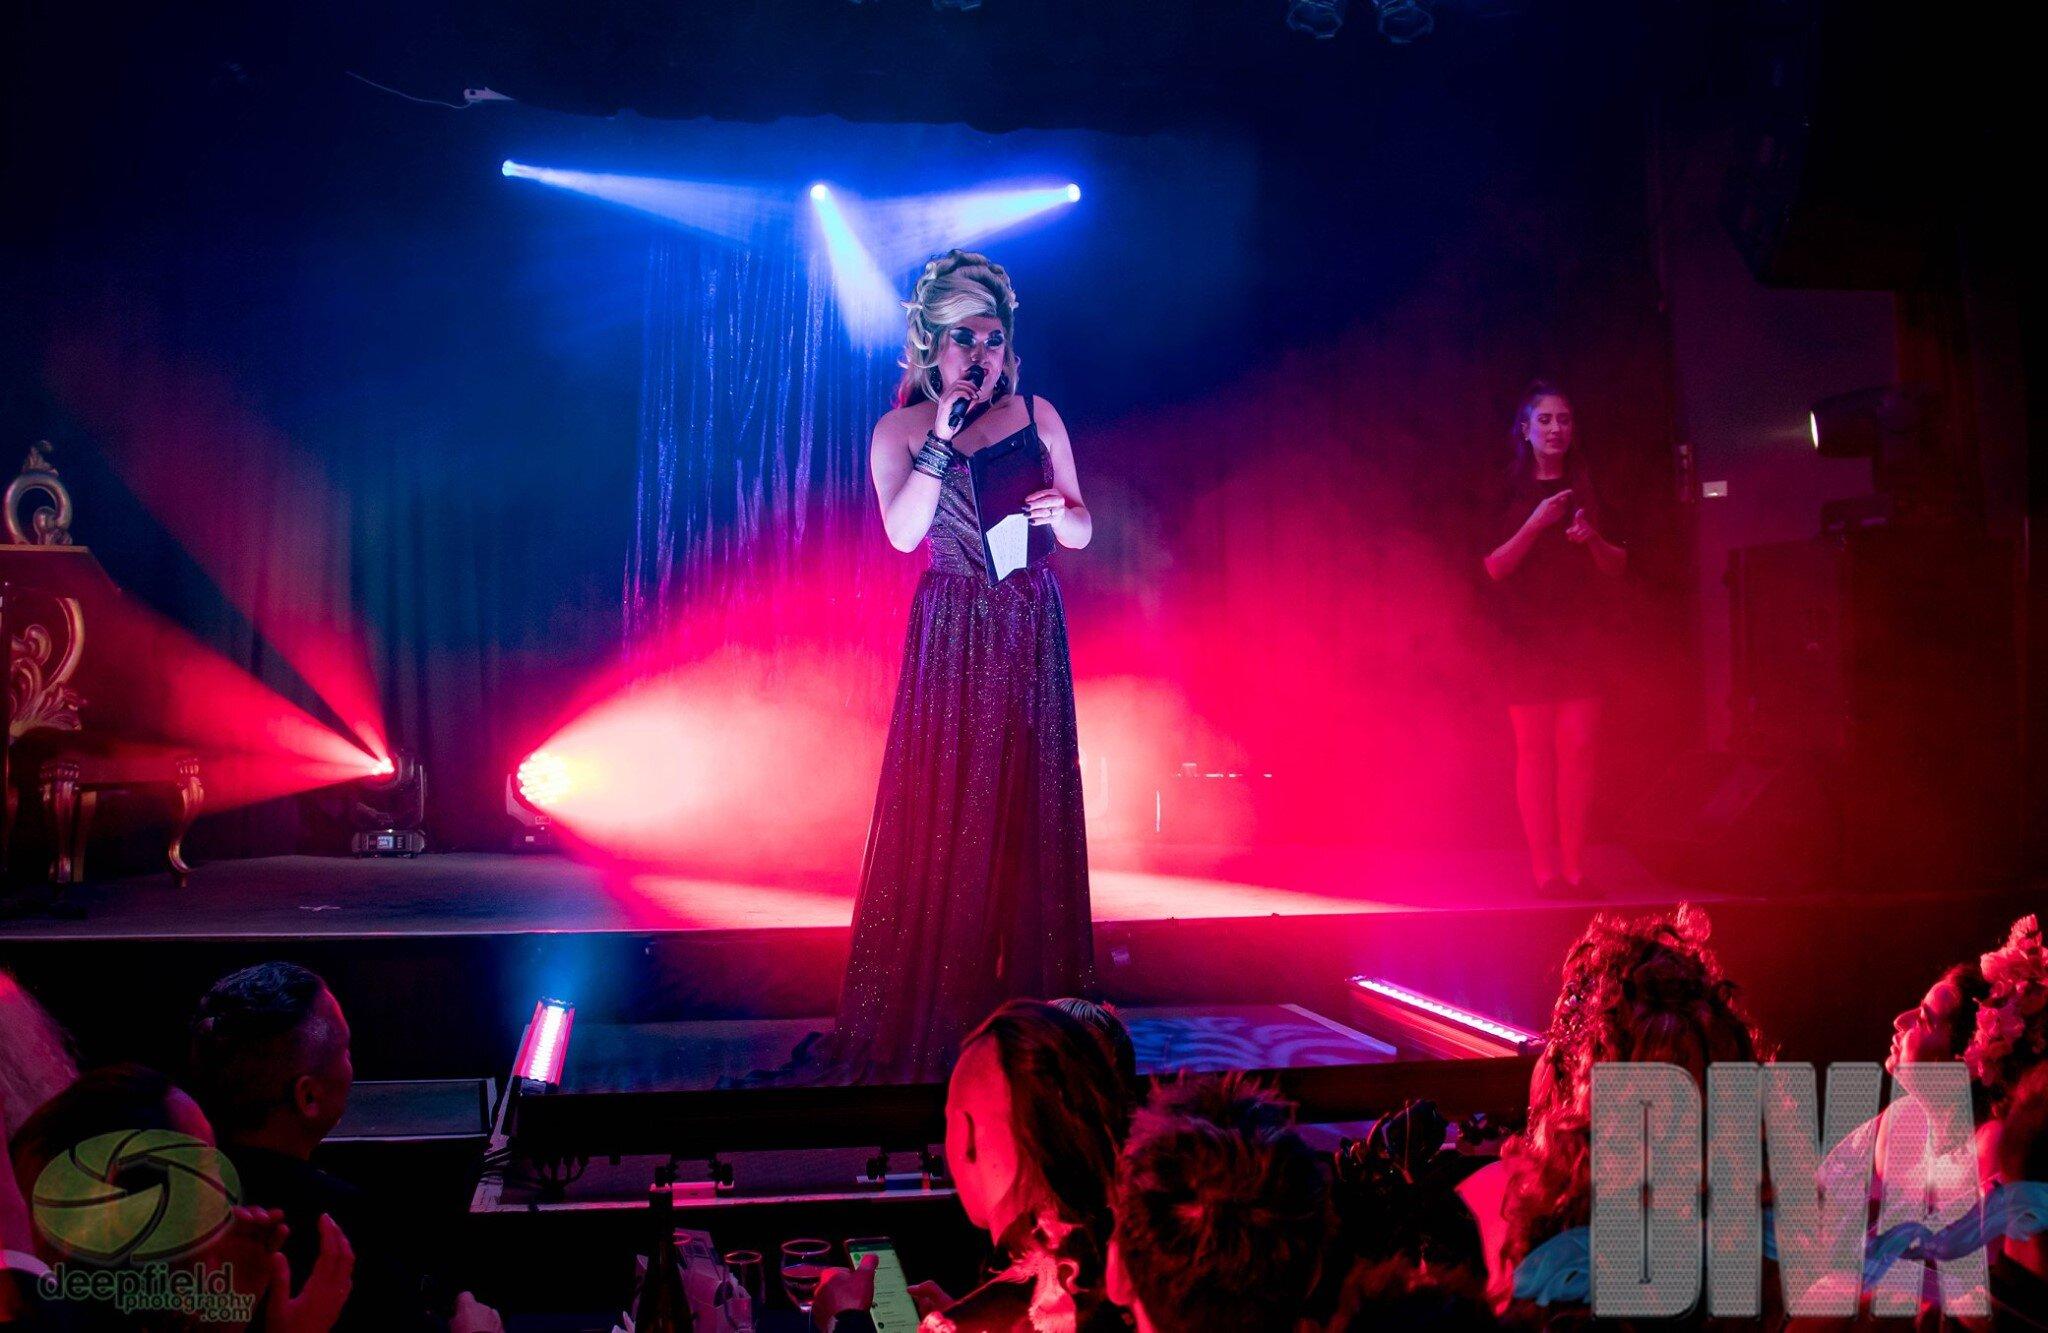 charisma-belle-corporate-host-event-hosting-diva-awards-sydney-drag-queen-royalty-best-hire-drag-race-australia-4.jpg